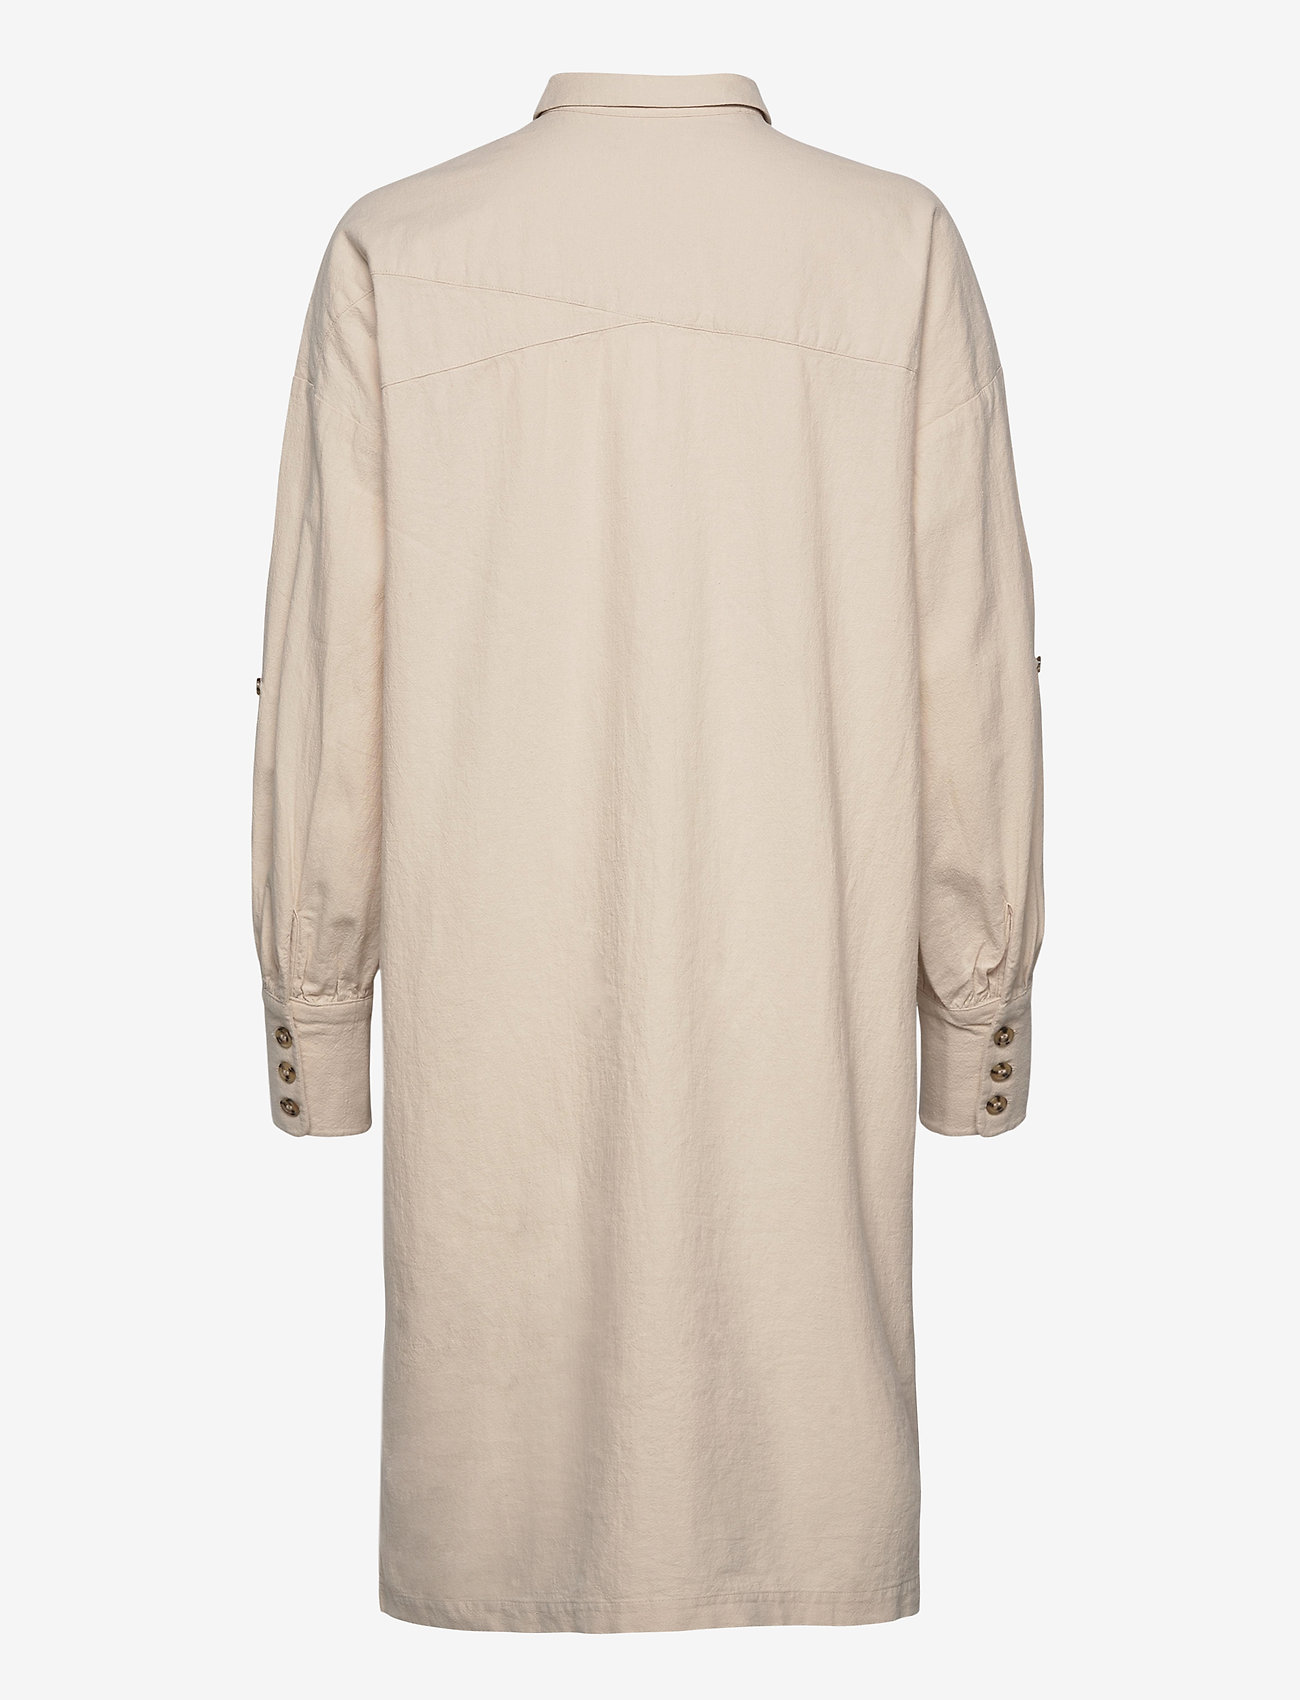 Selected Femme - SLFMALVINA-TONIA LS SHIRT DRESS B - shirt dresses - sandshell